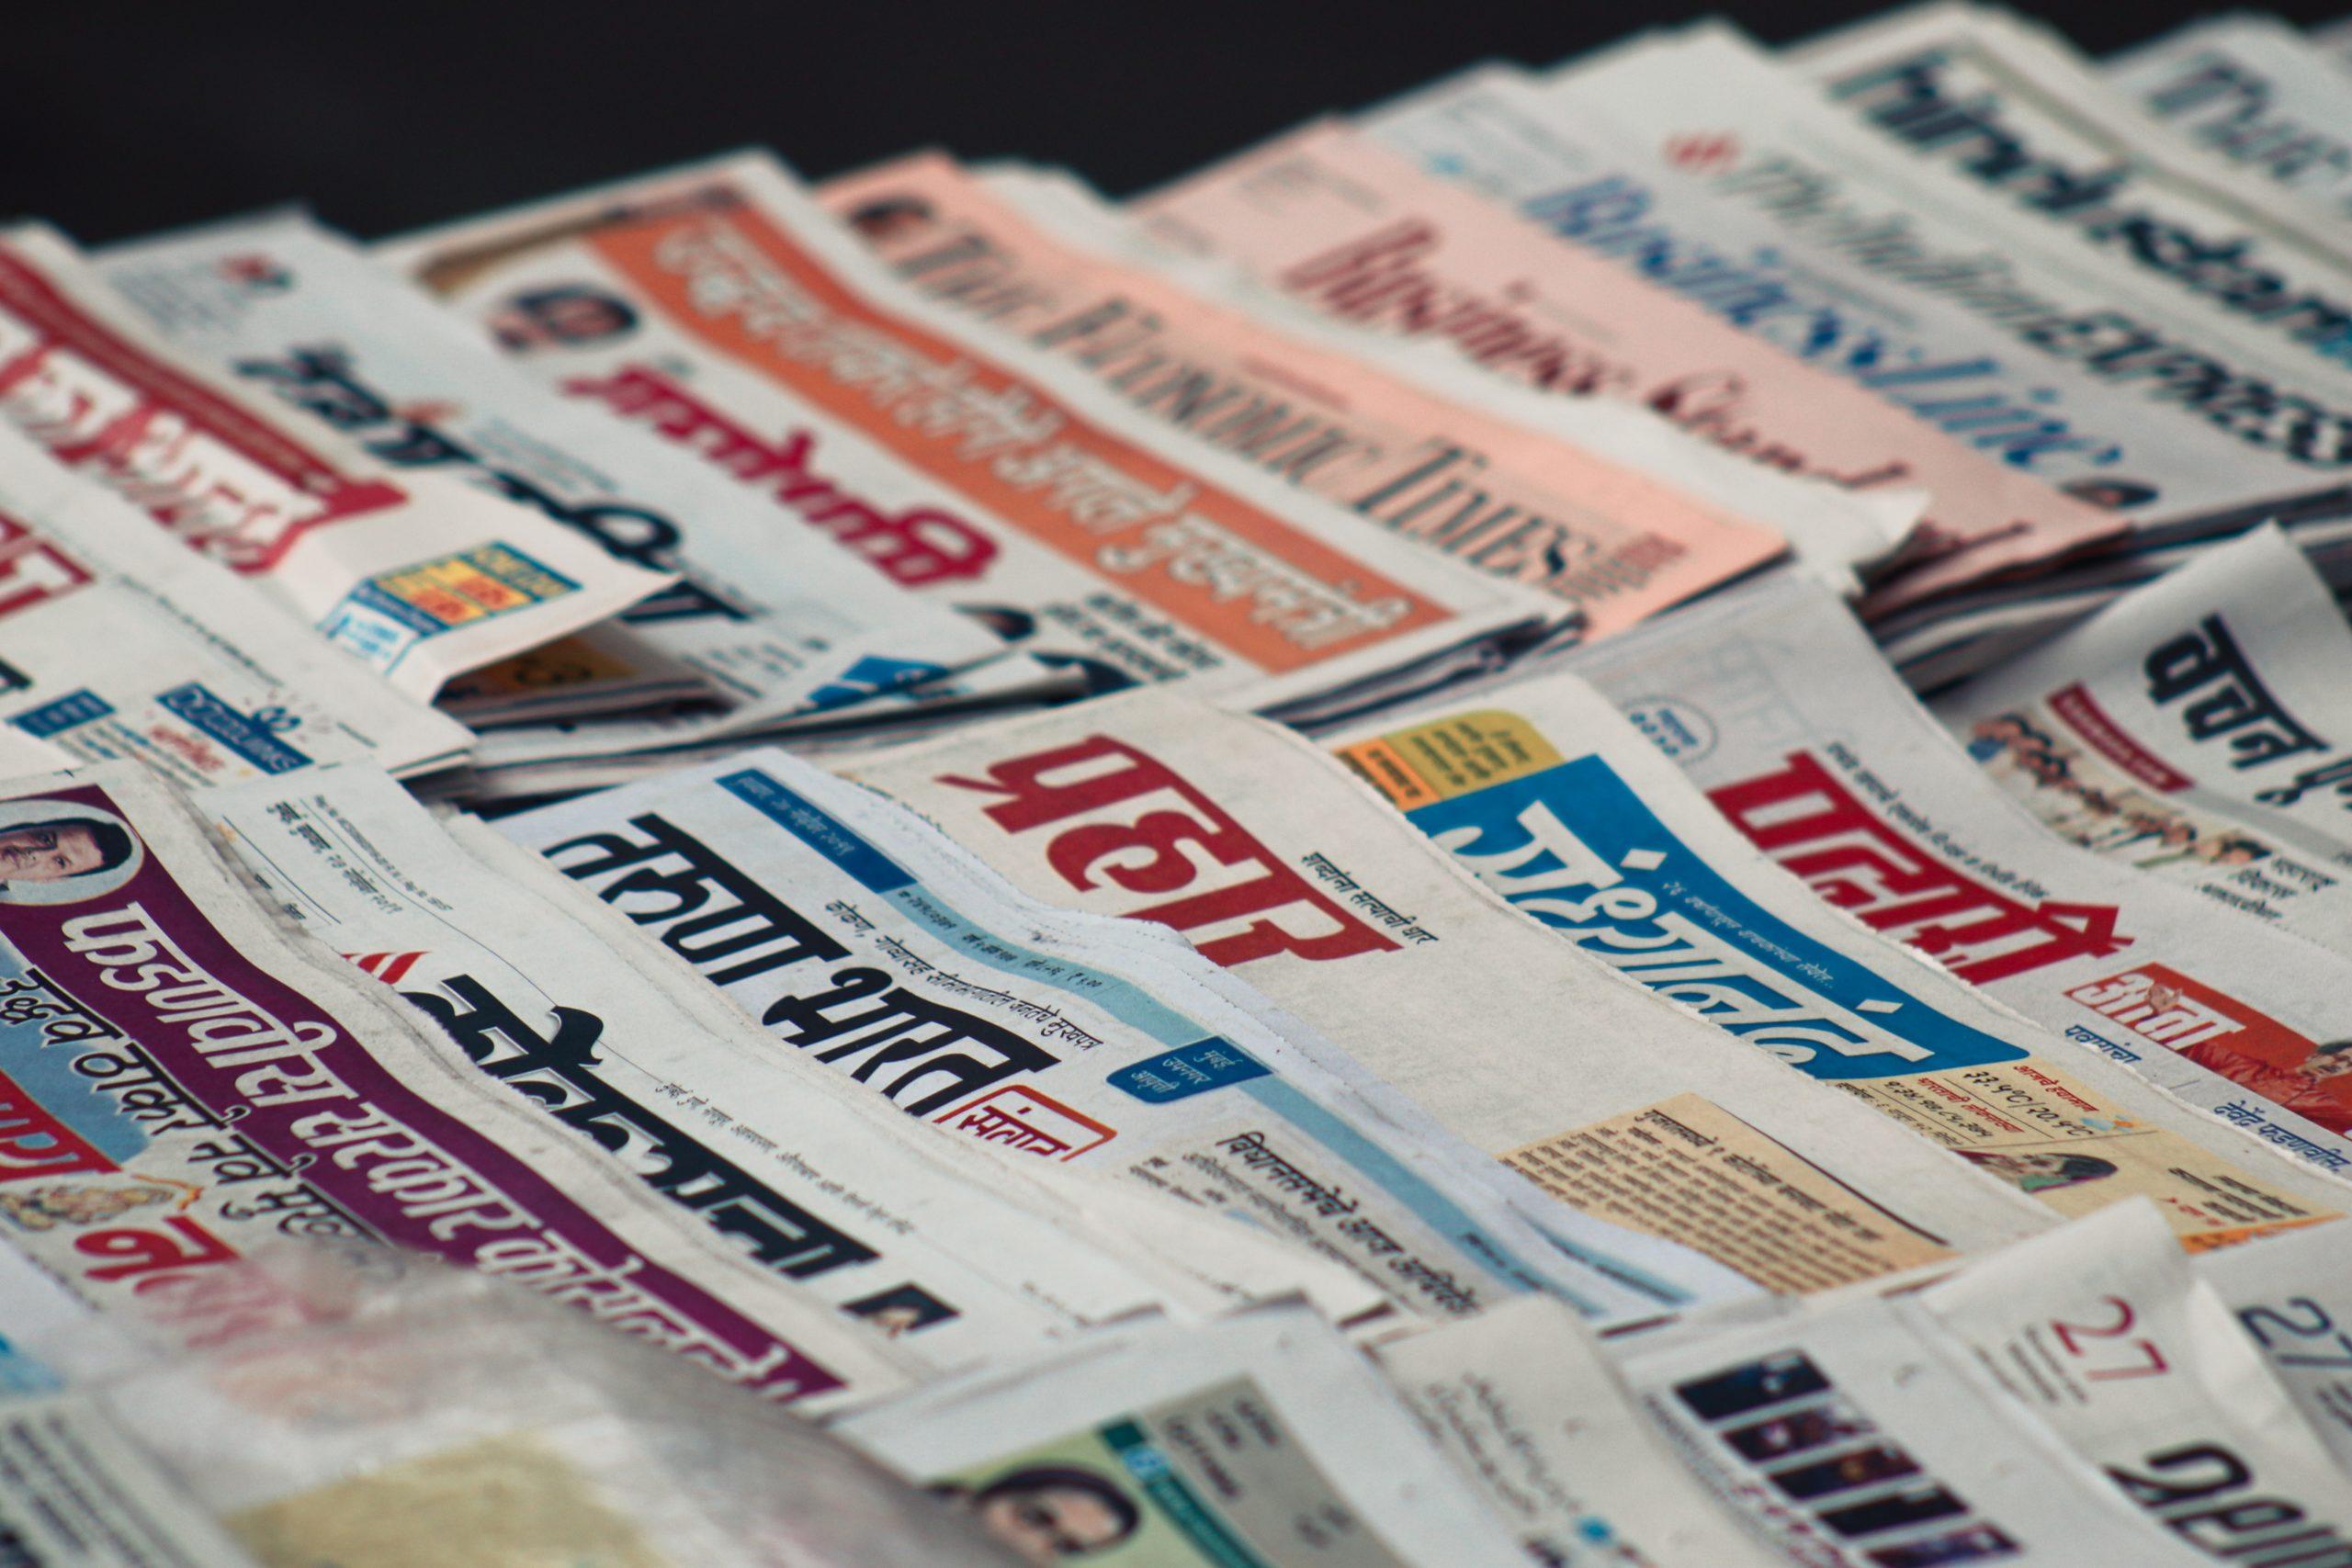 macro photography of assorted newspaper